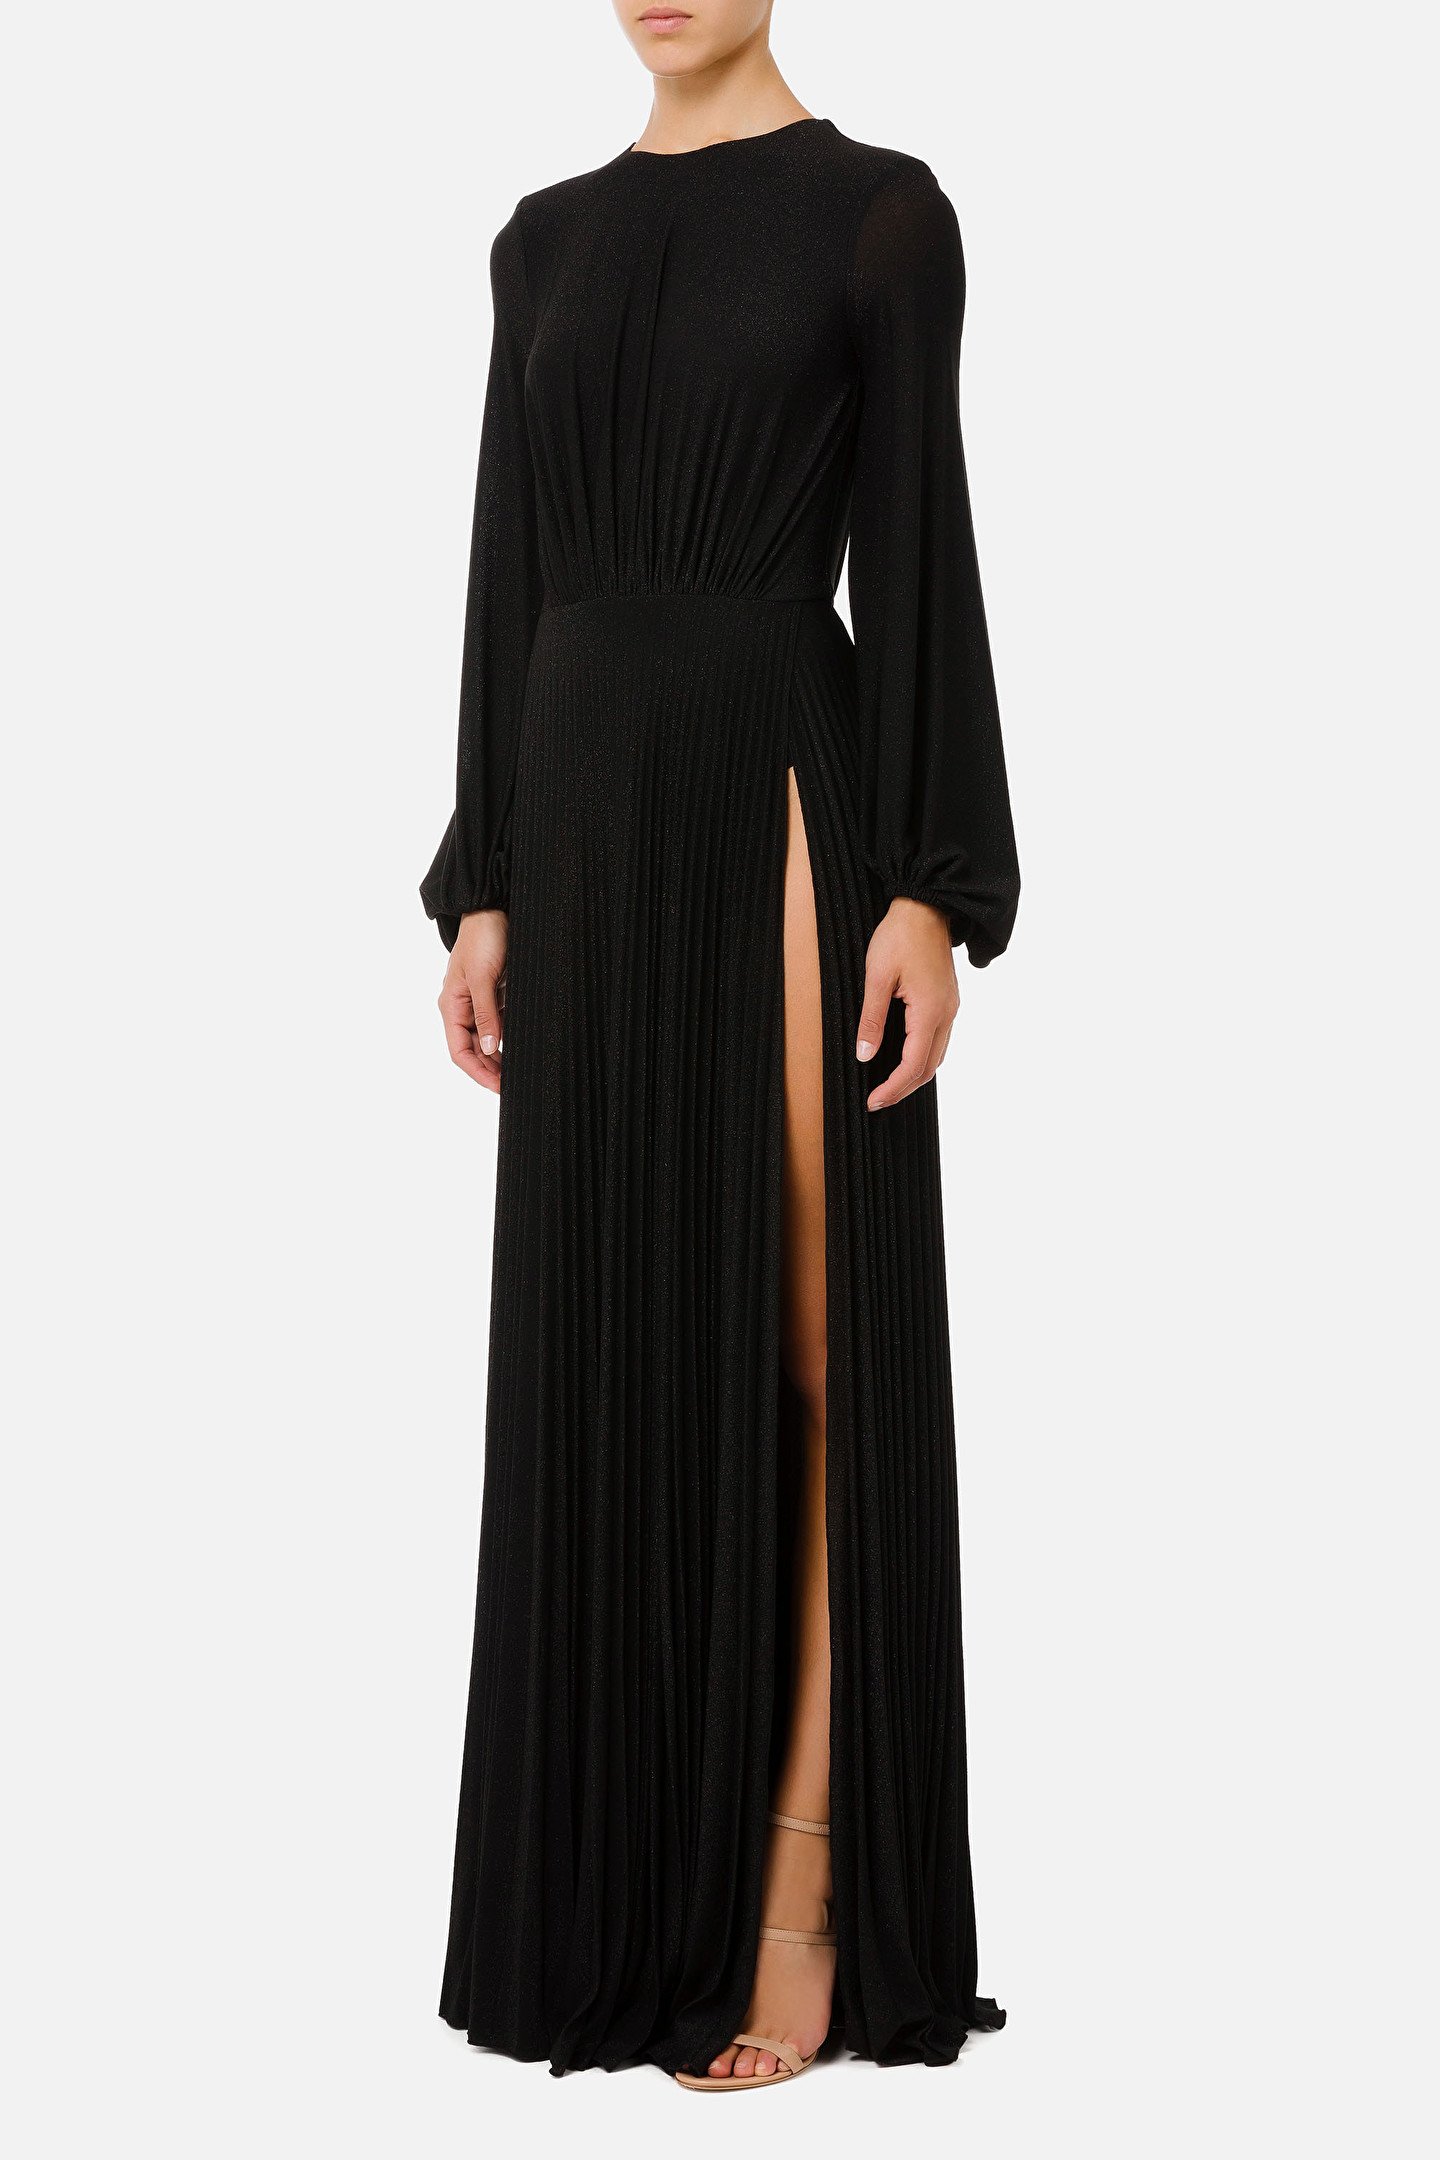 ELISABETTA FRANCHI | Dress  | AB05816E2110